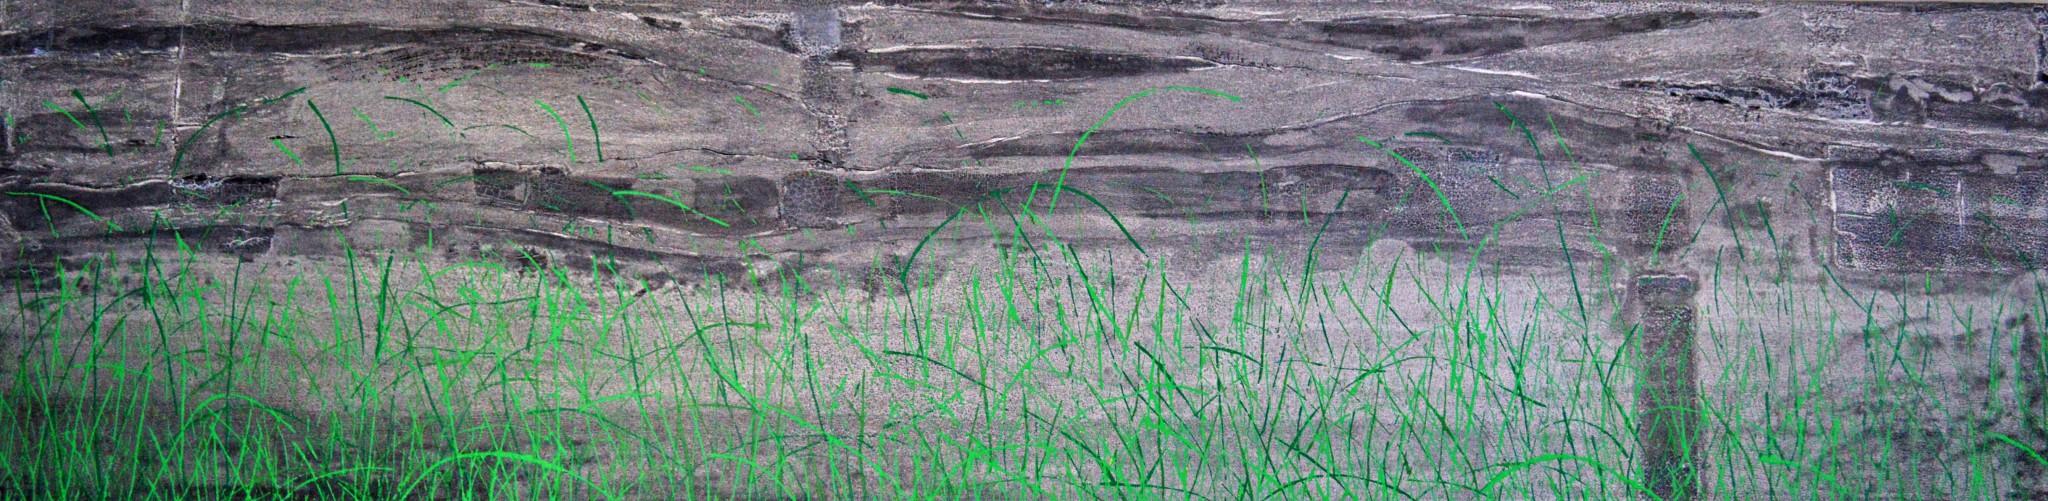 Öl/Lack/Patina/Rinde/Strukturpaste/Leinwand, 200 x 50 cm